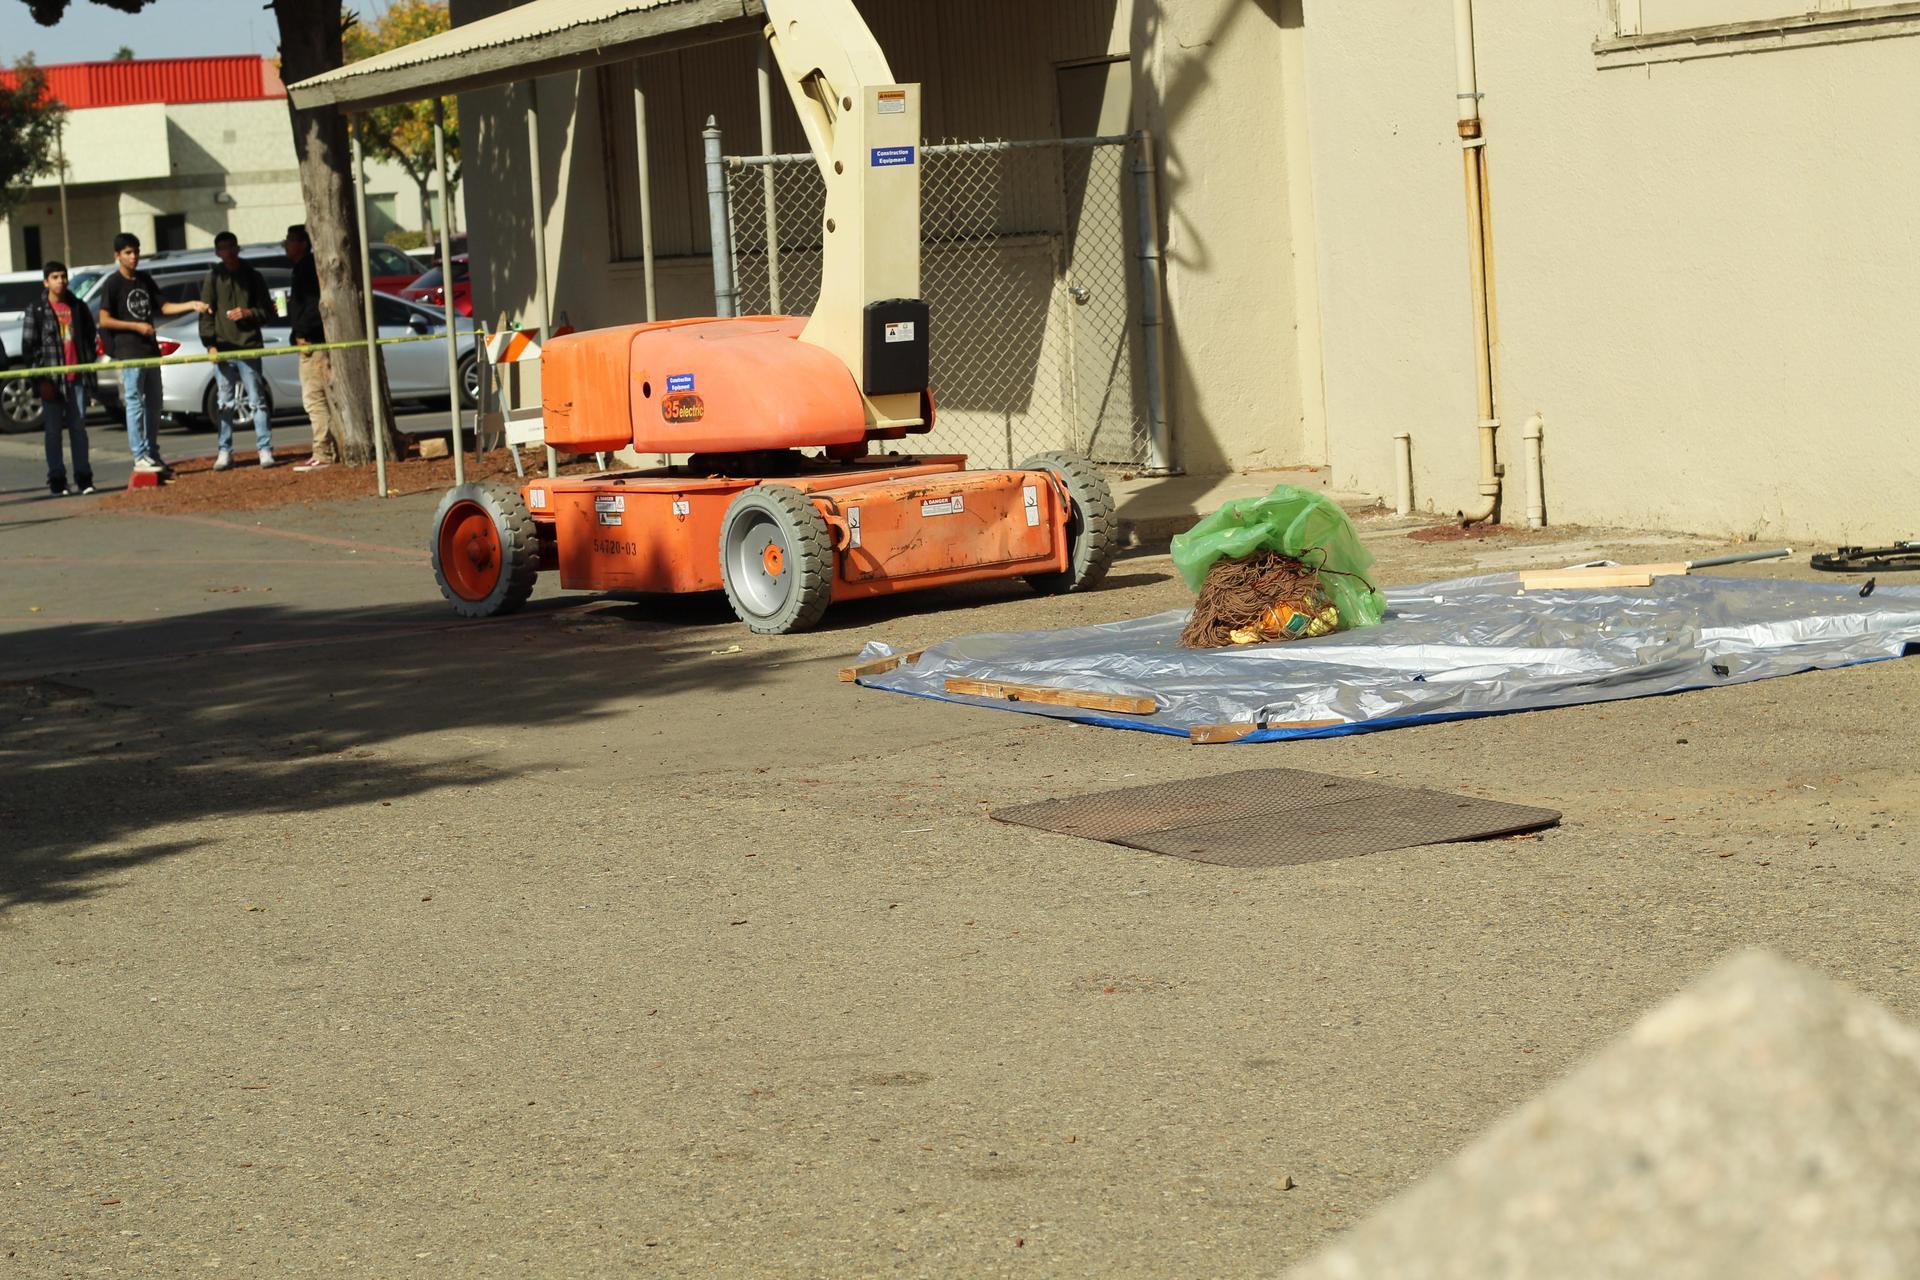 Team two pumpkin hitting the ground